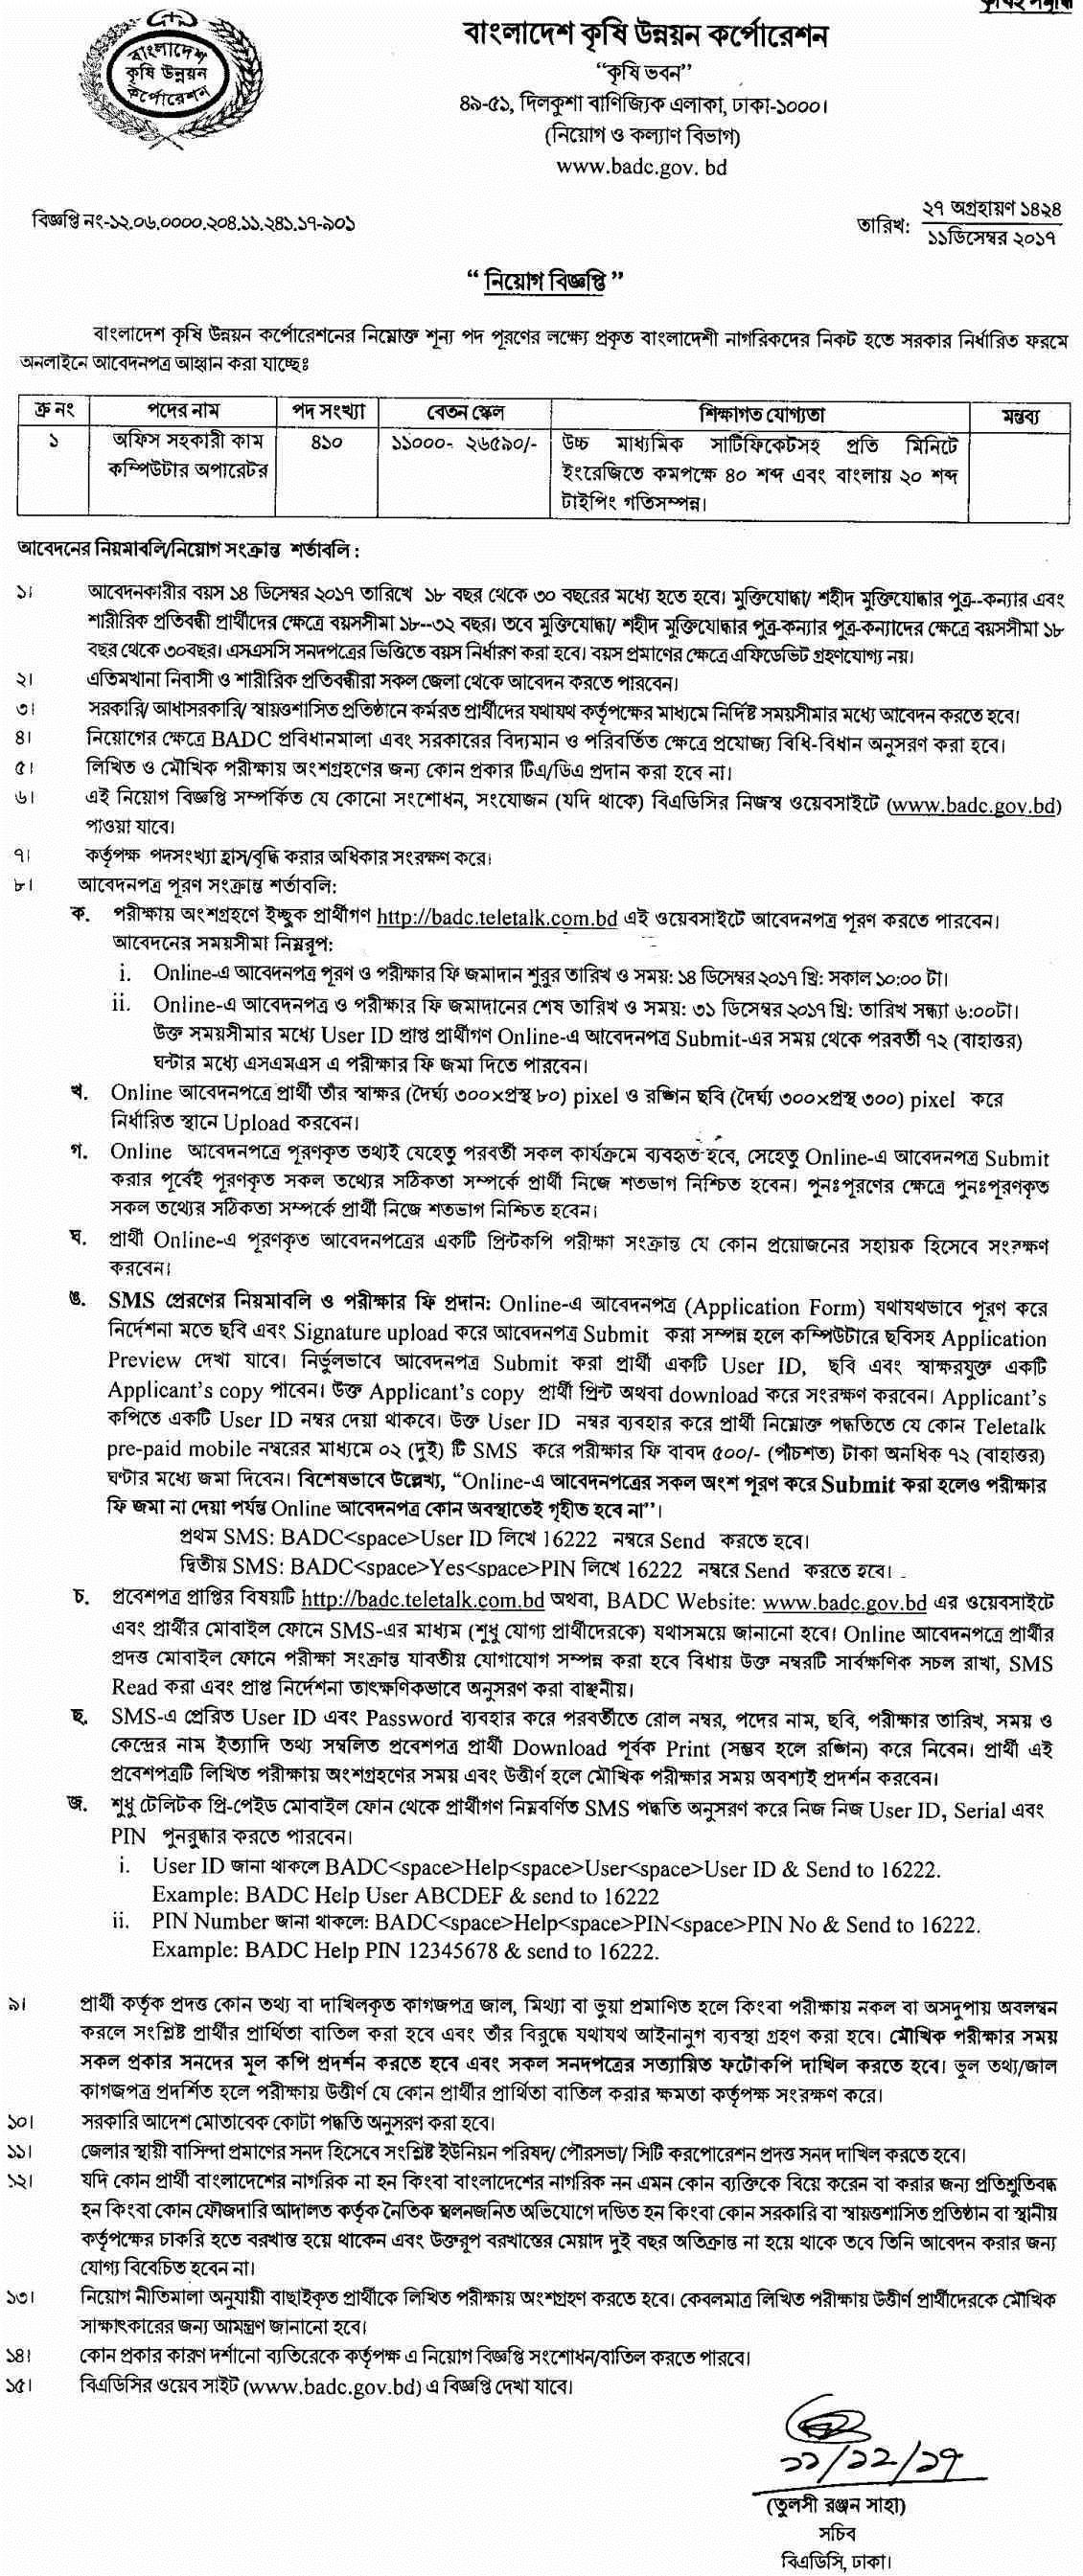 Bangladesh Agricultural Development Corporation (BADC) Job Circular 2017